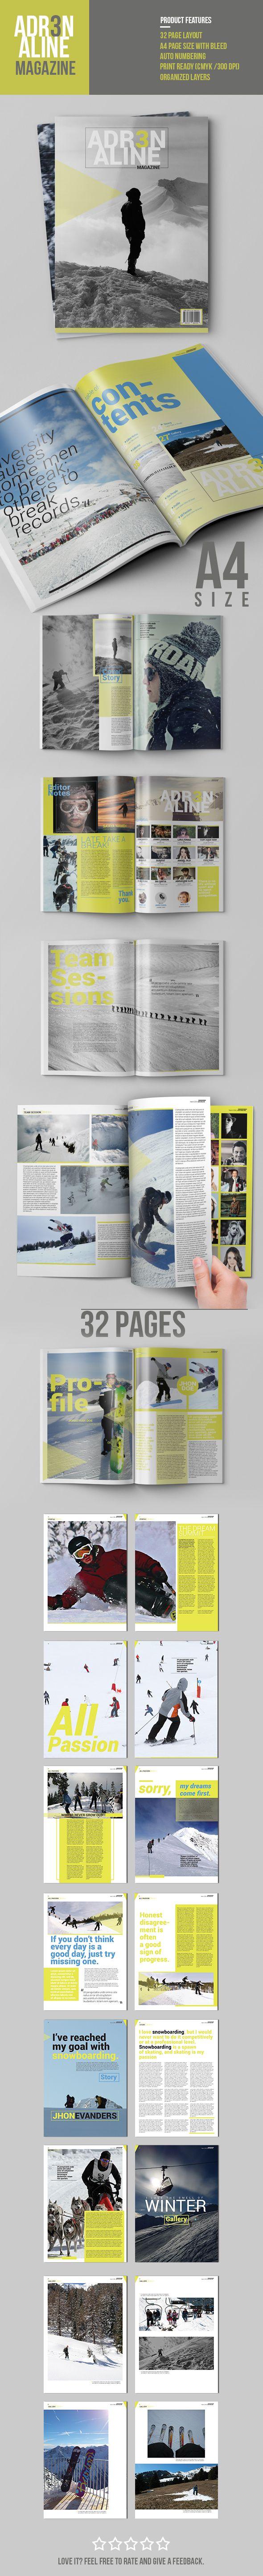 Adrenaline Magazine Template on Behance